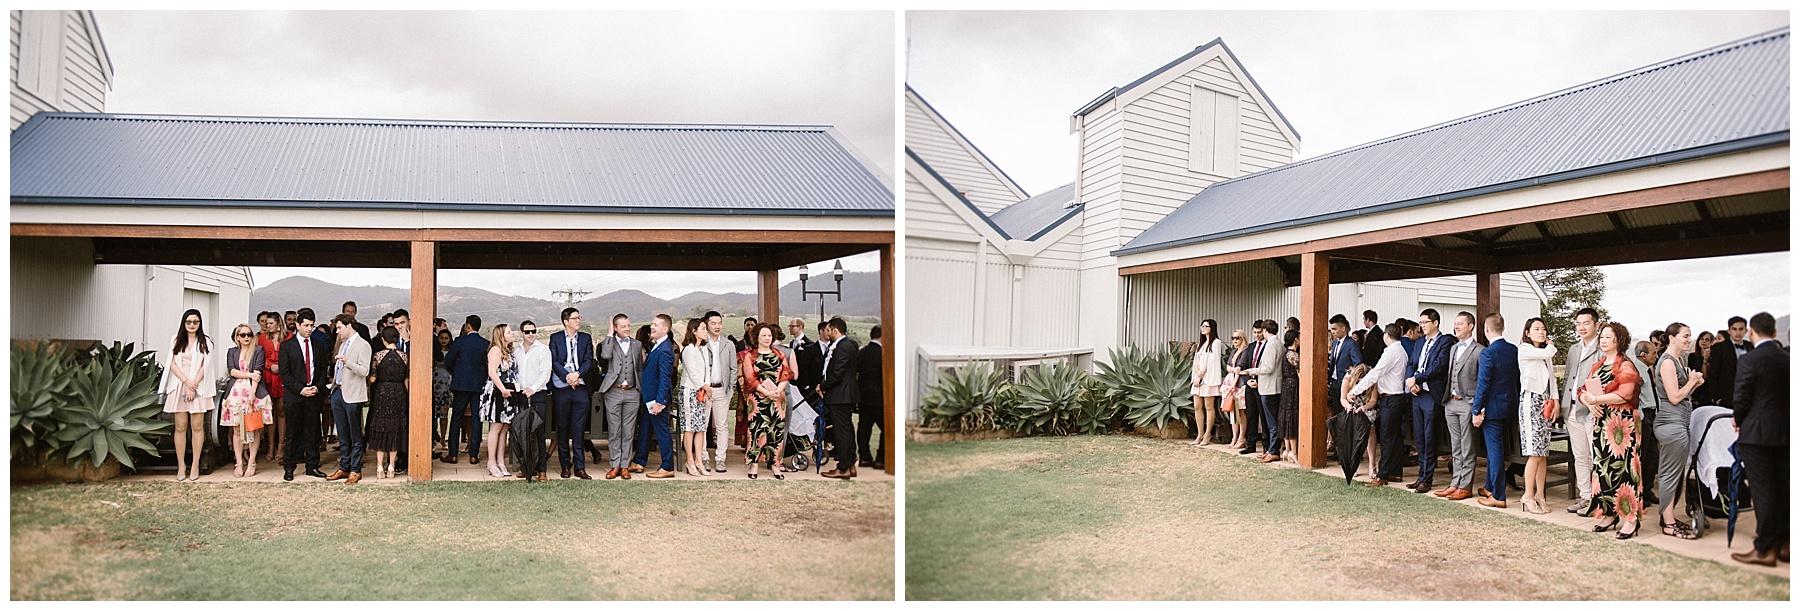 AUDREY WILKING COCKFIGHTERS GHOST Wedding Photographer_0027.jpg